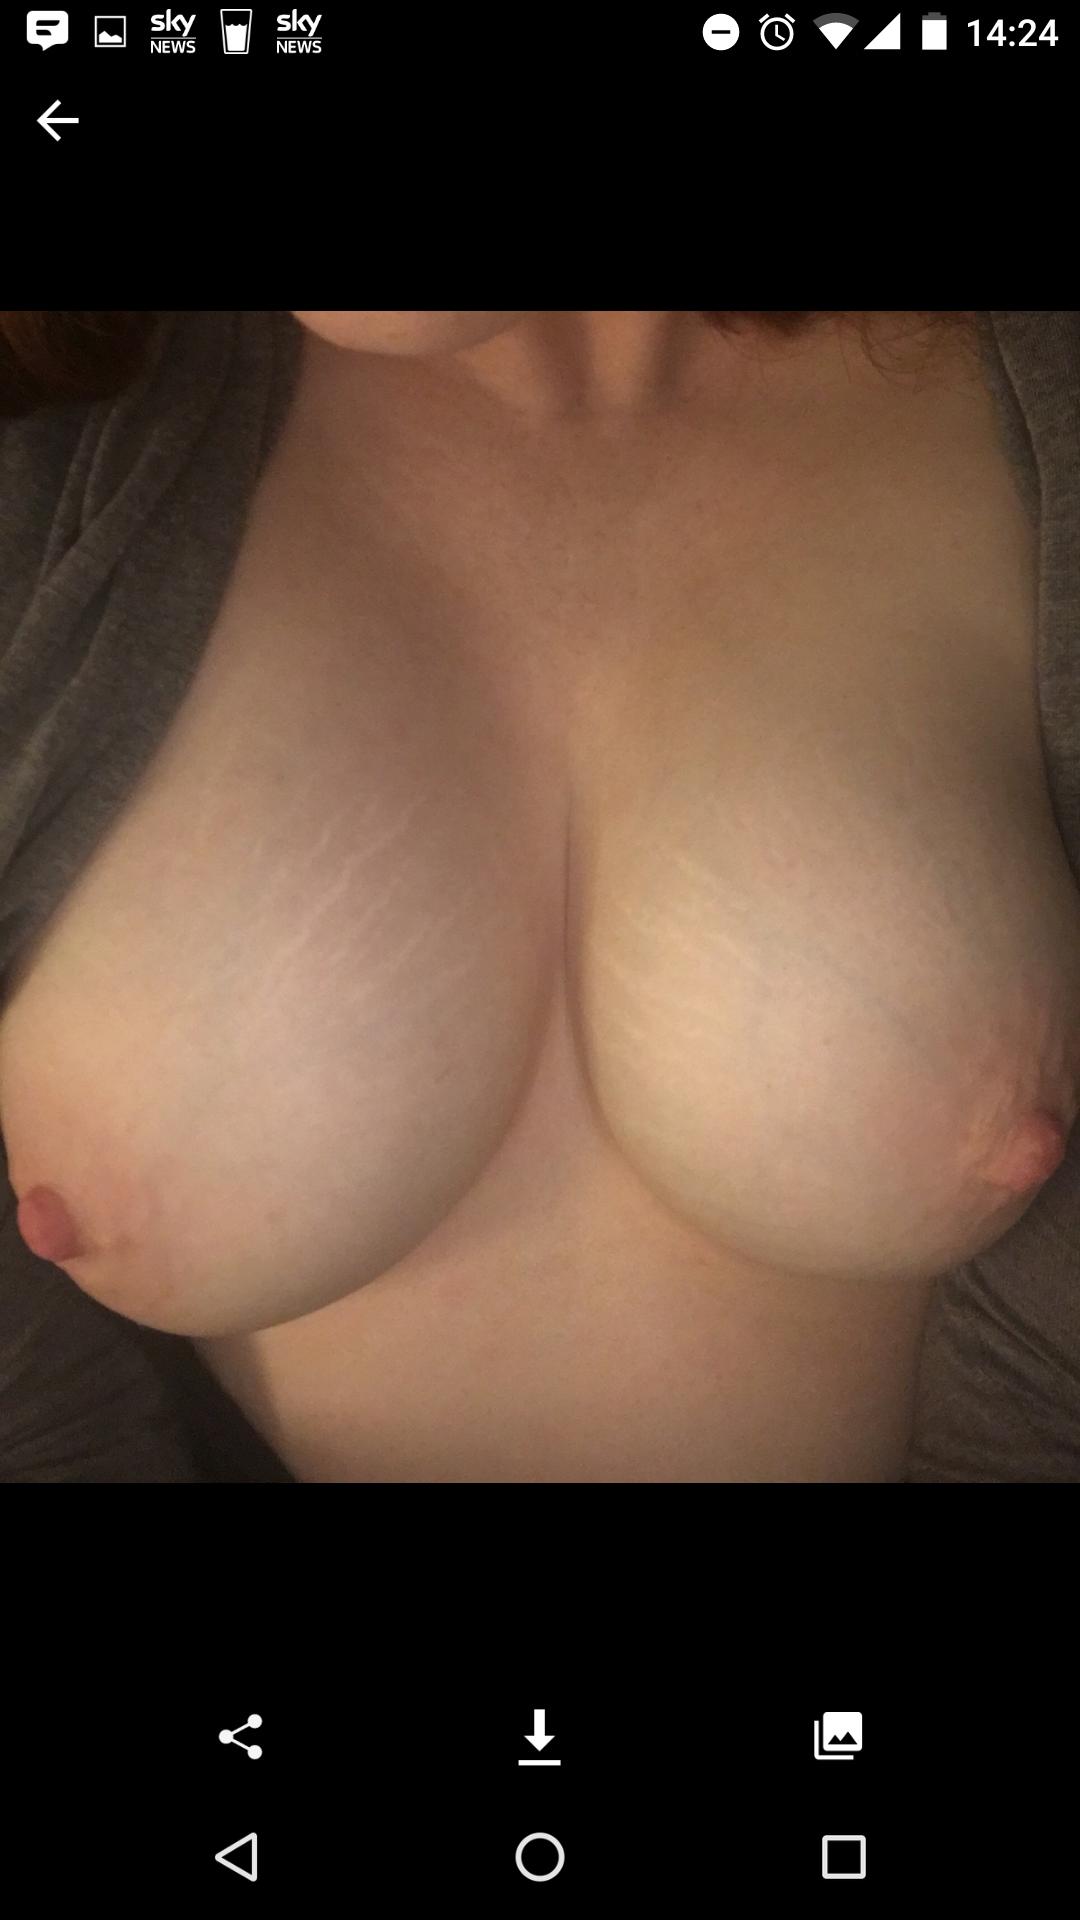 Kingdom amateur breasts